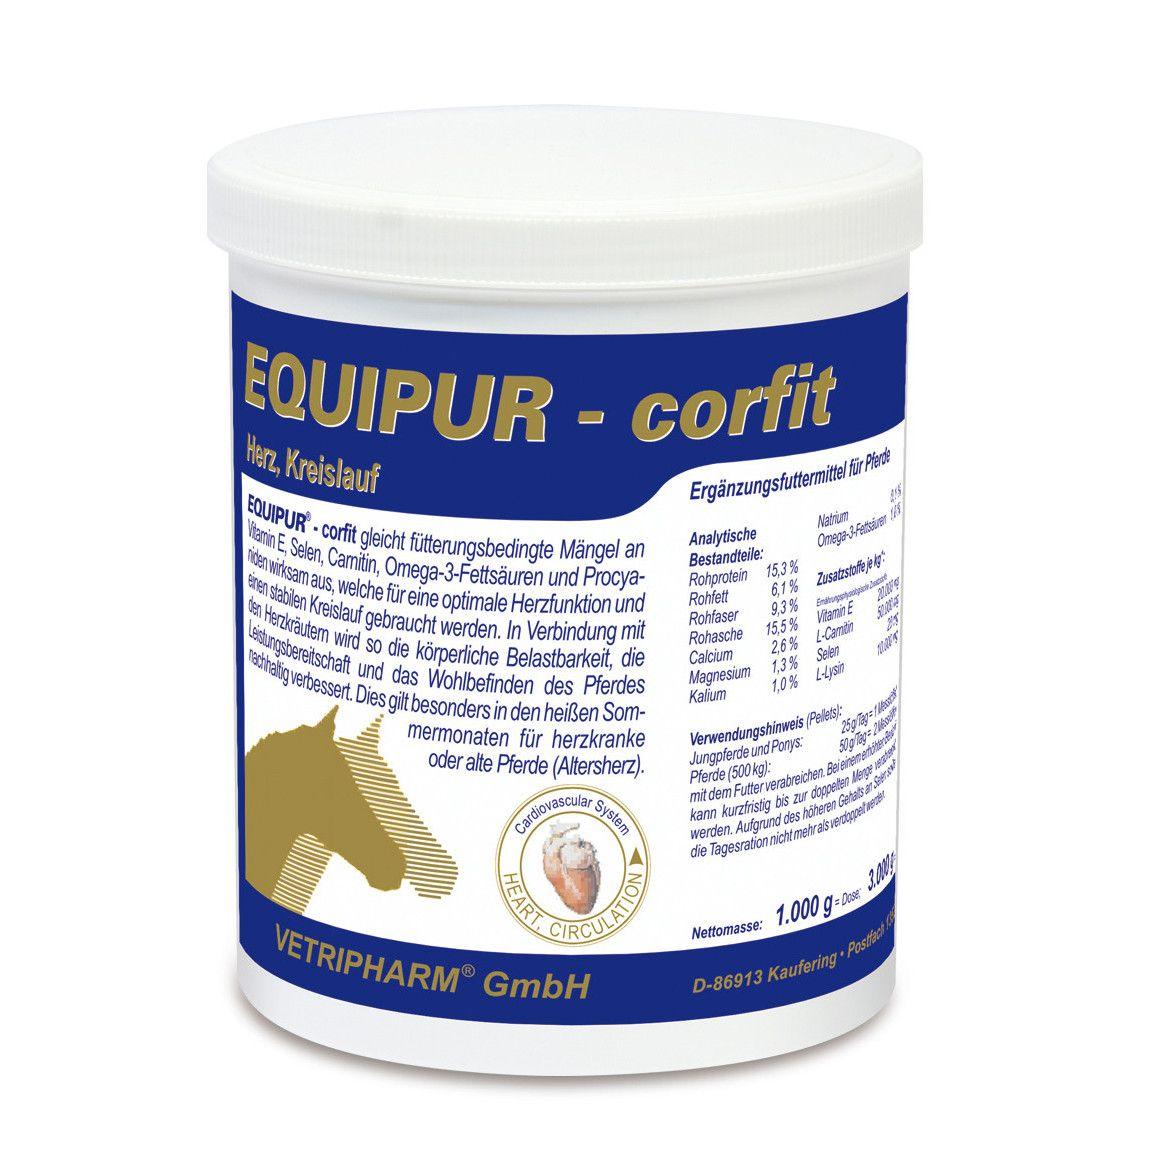 Vetripharm Equipur corfit